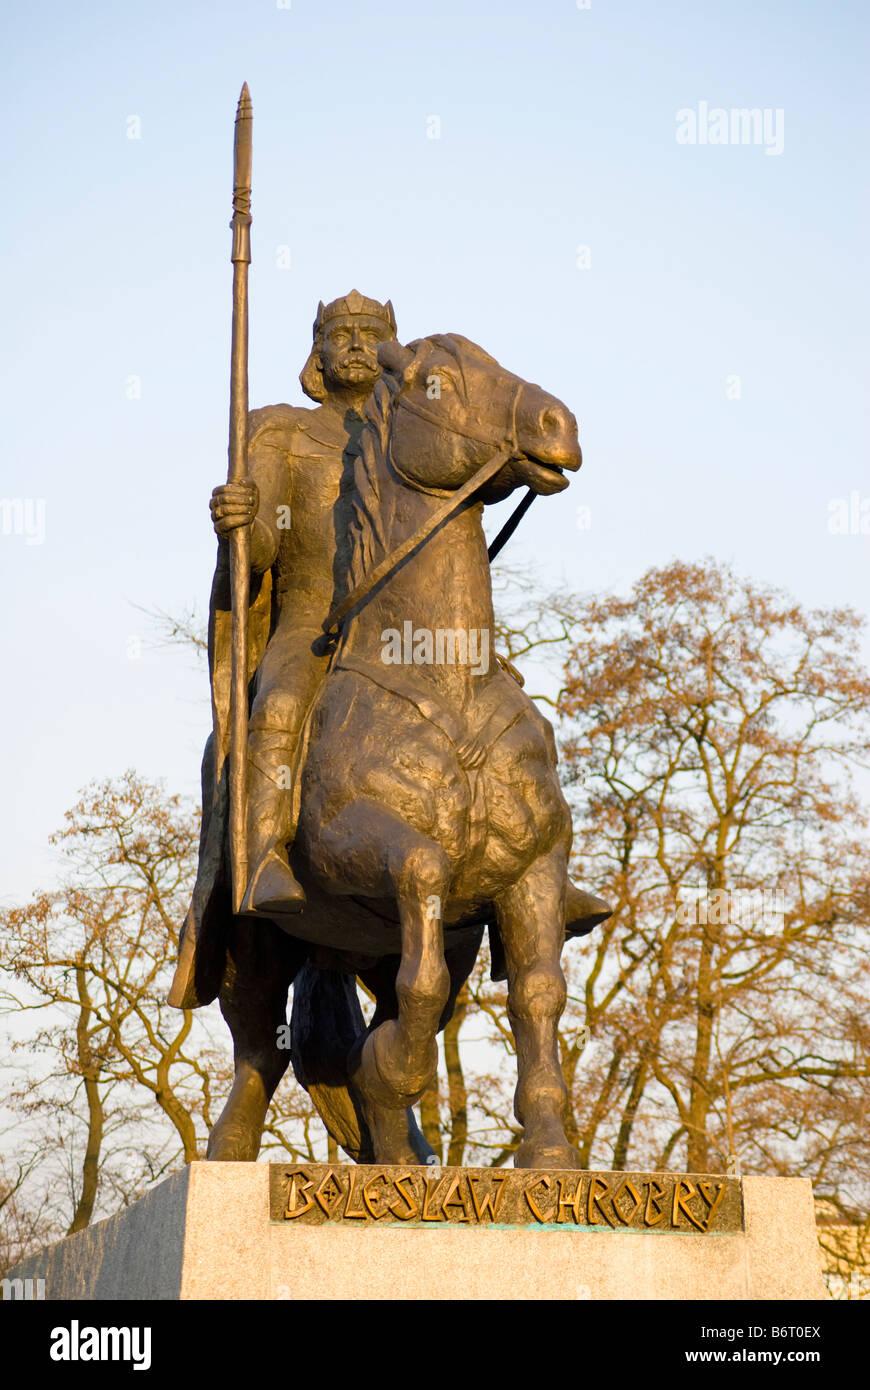 King Boleslaw Chrobry Of Poland - 992-1025 the Brave Bronze Medal